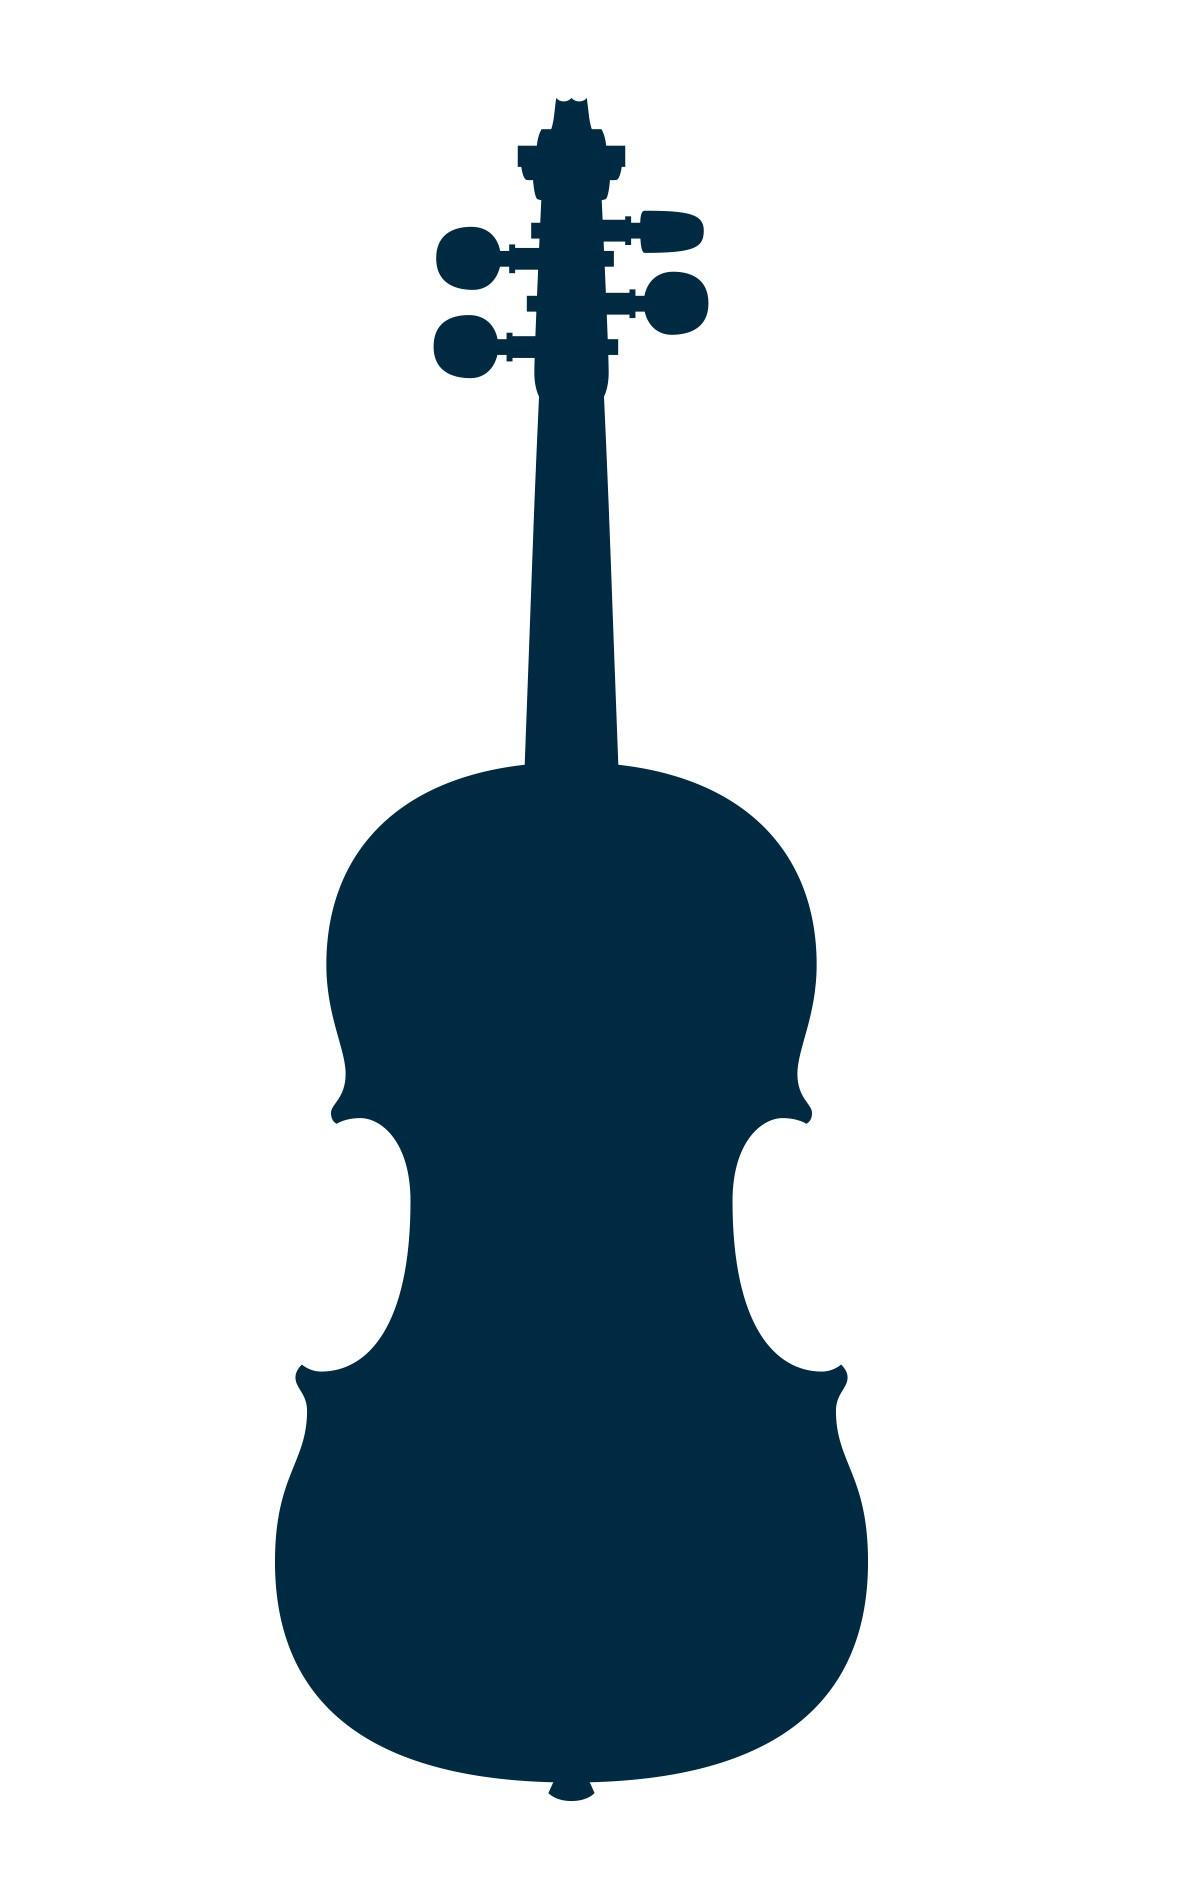 Contemporary German Grüner violin